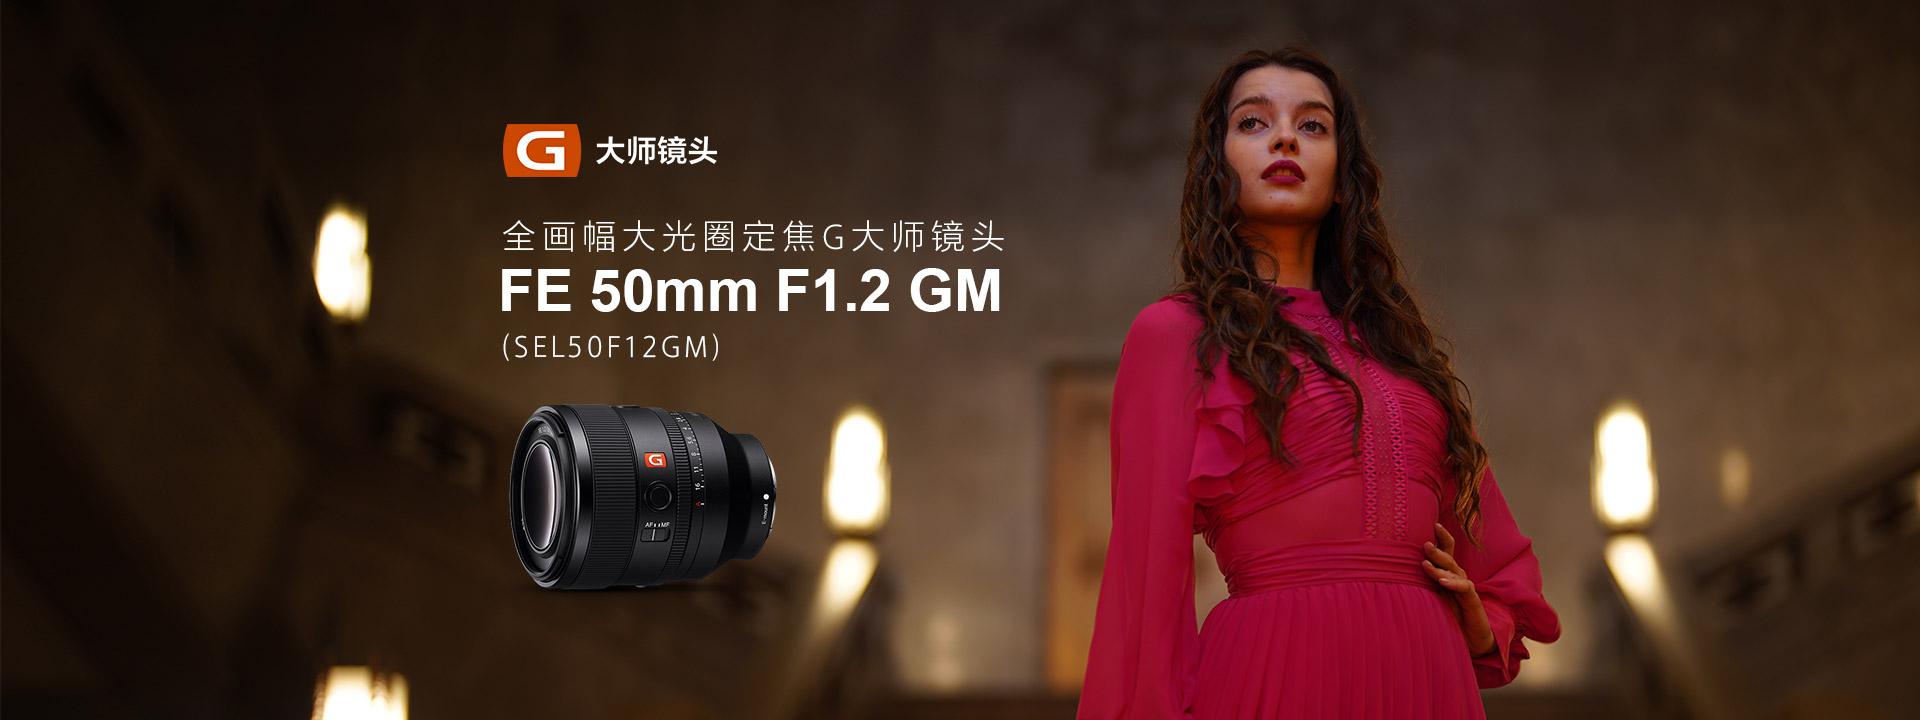 全画幅大光圈定焦G大师镜头FE 50mm F1.2 GM(SEL50F12GM)